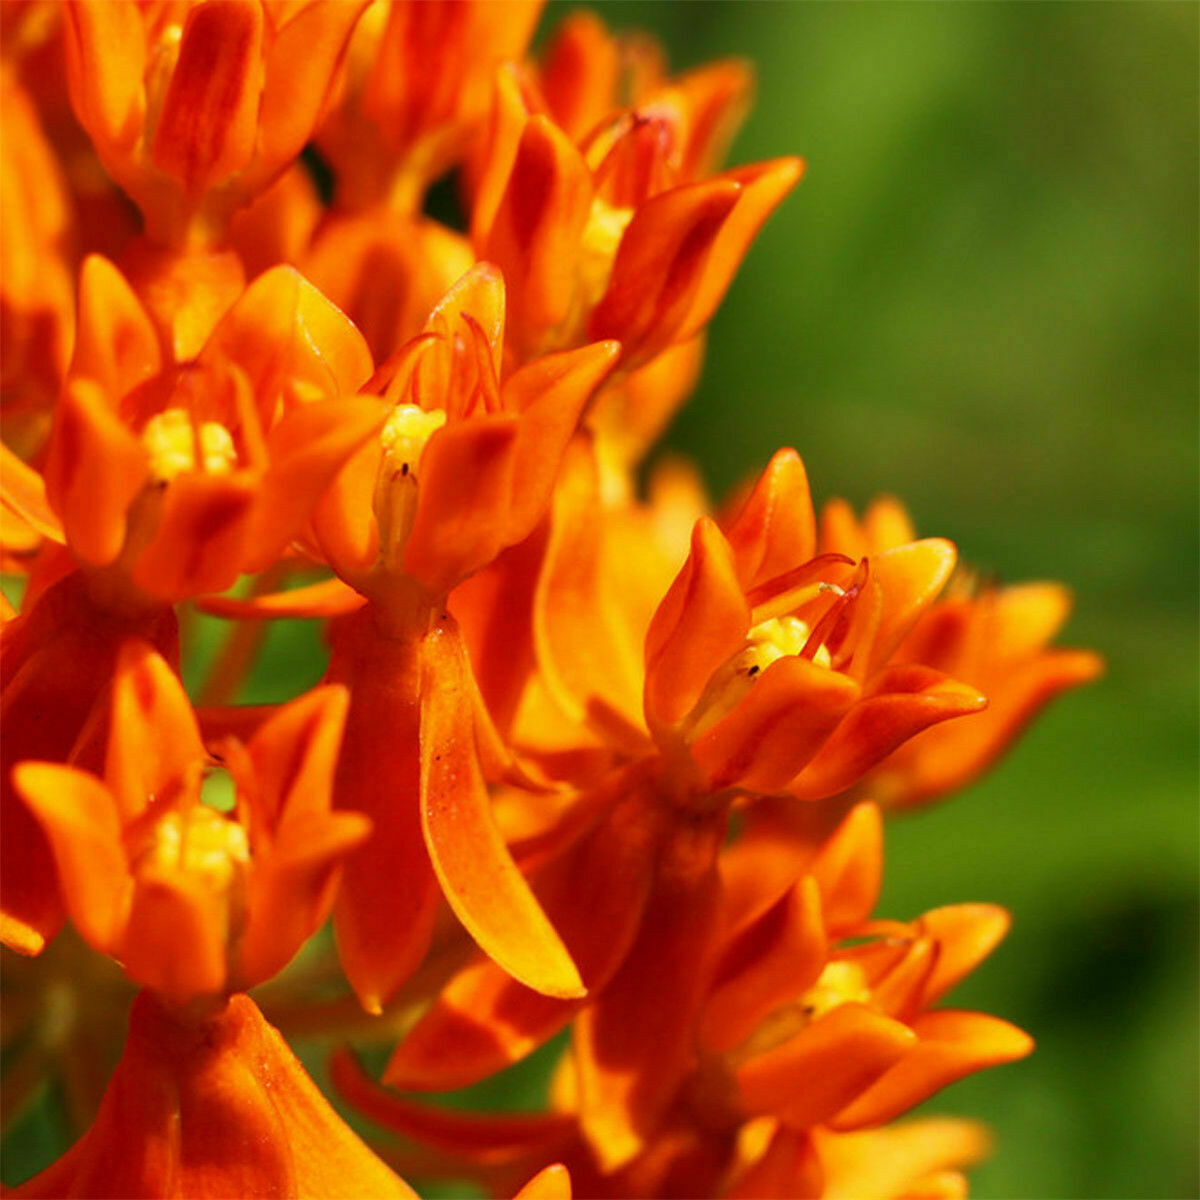 30x stücke Datura Brugmansia Samen Blumensamen Bonsai Engel Trompeten Hausgarten